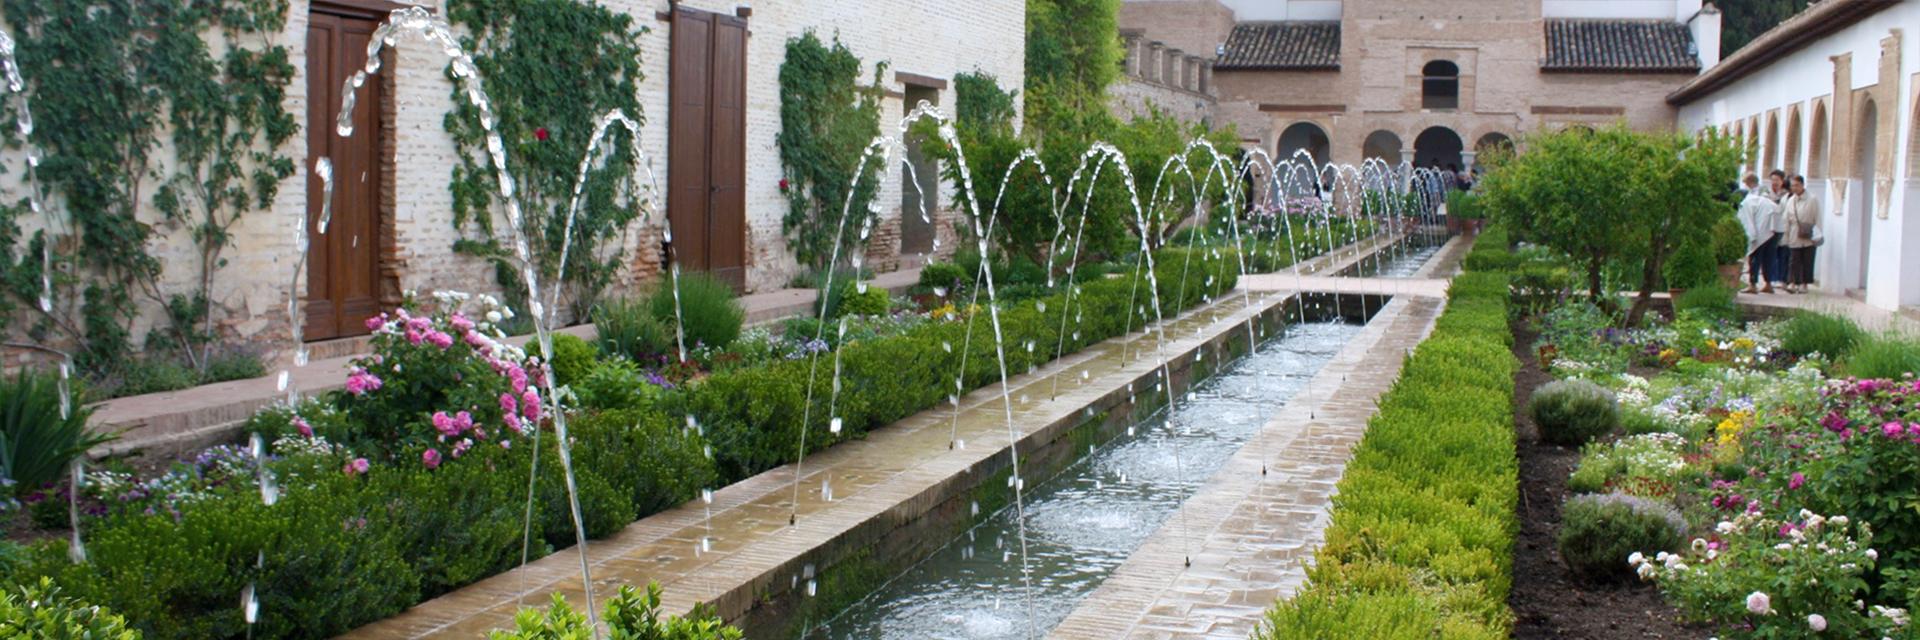 Global-Programs-Spain-Study-Abroad-Auburn-Horticulture-Club-sm.jpg